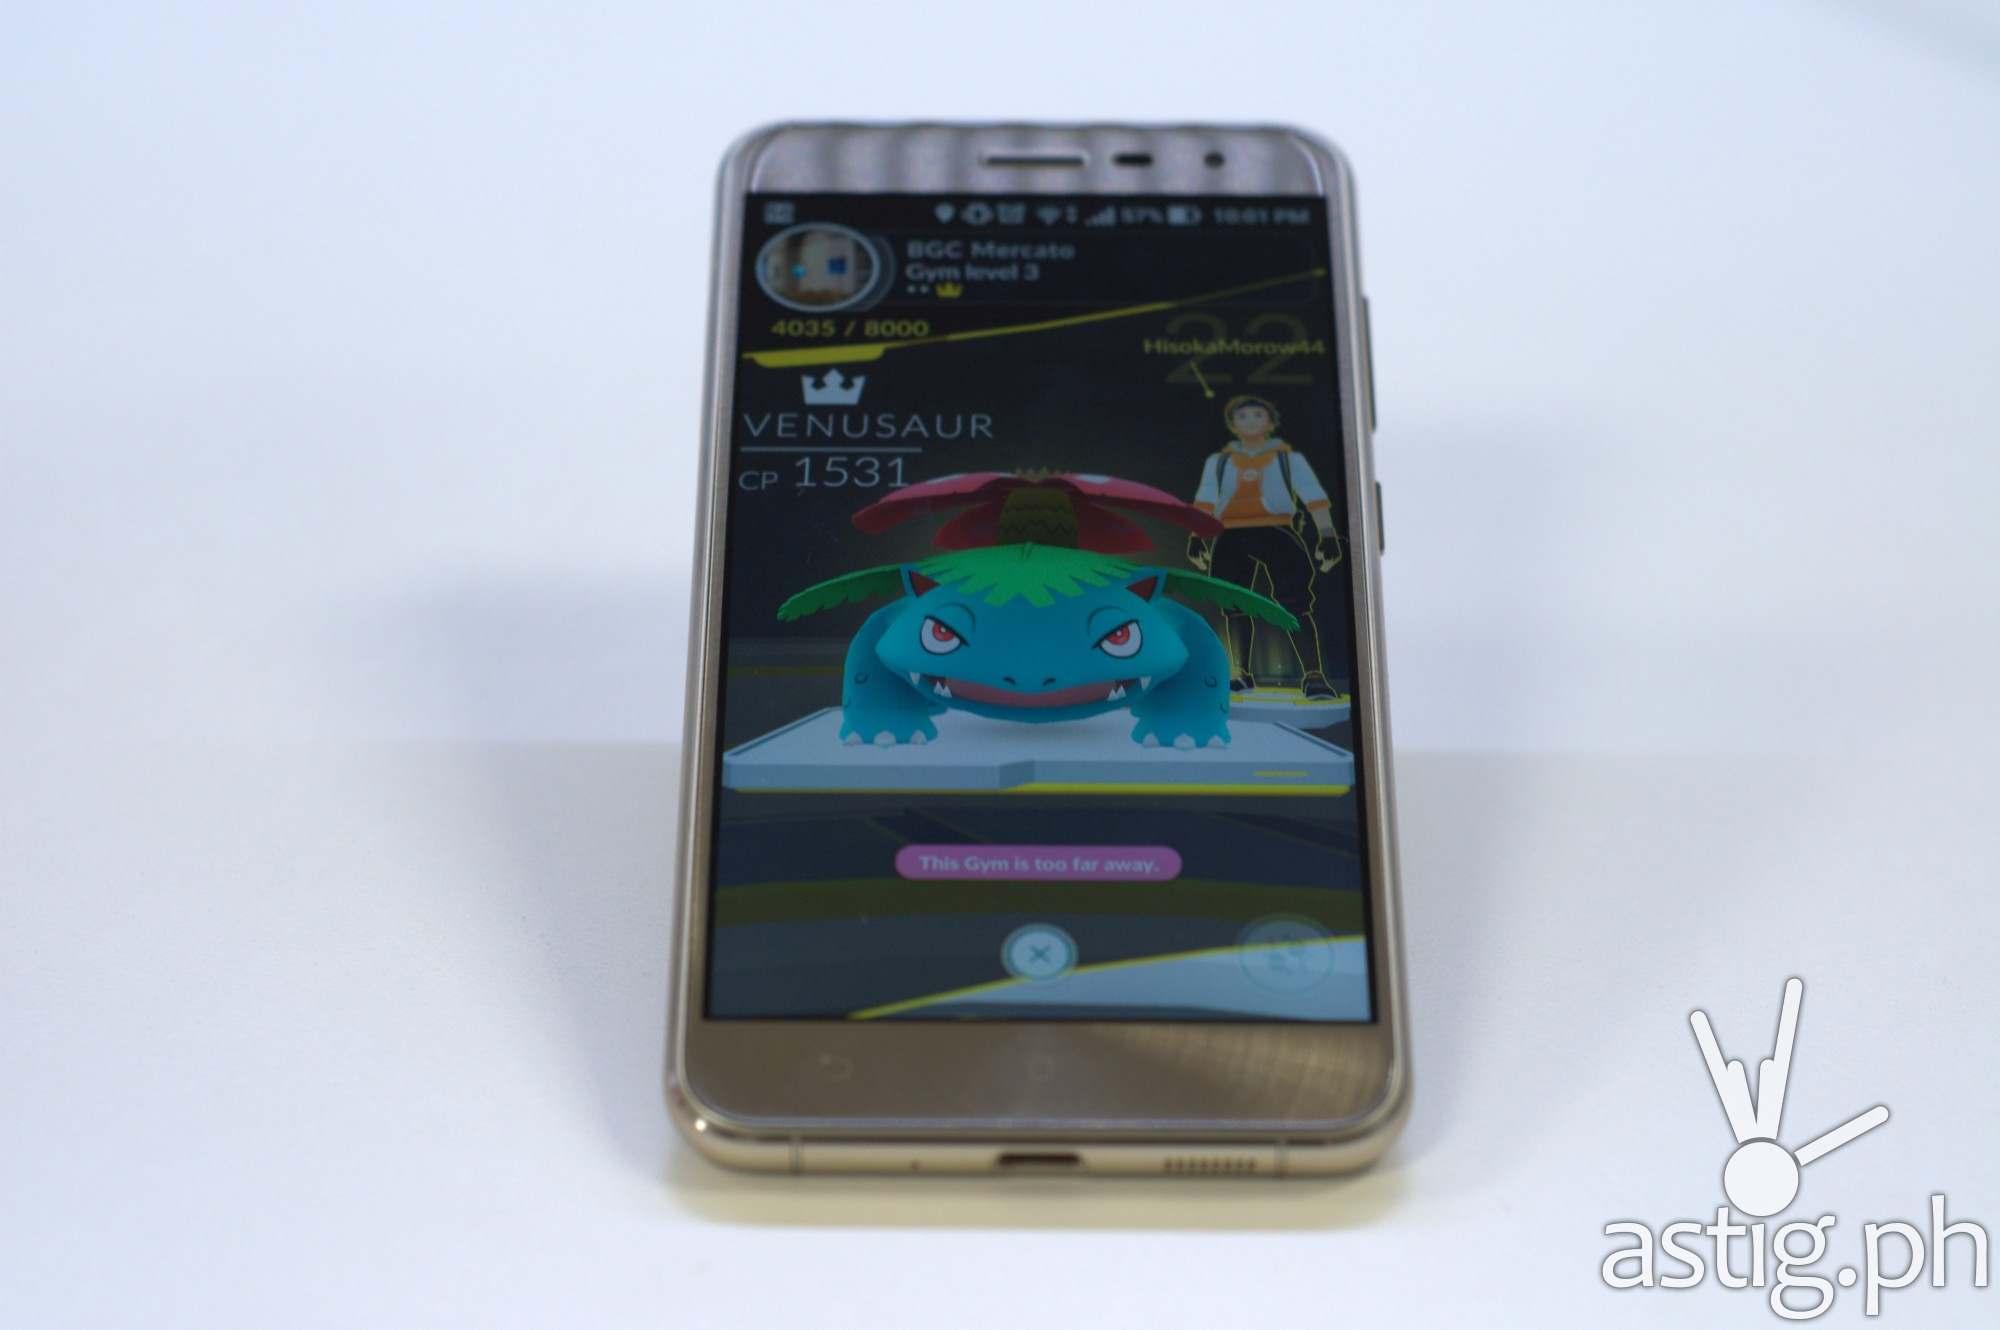 ASUS ZenFone 3 gaming - Pokemon Go